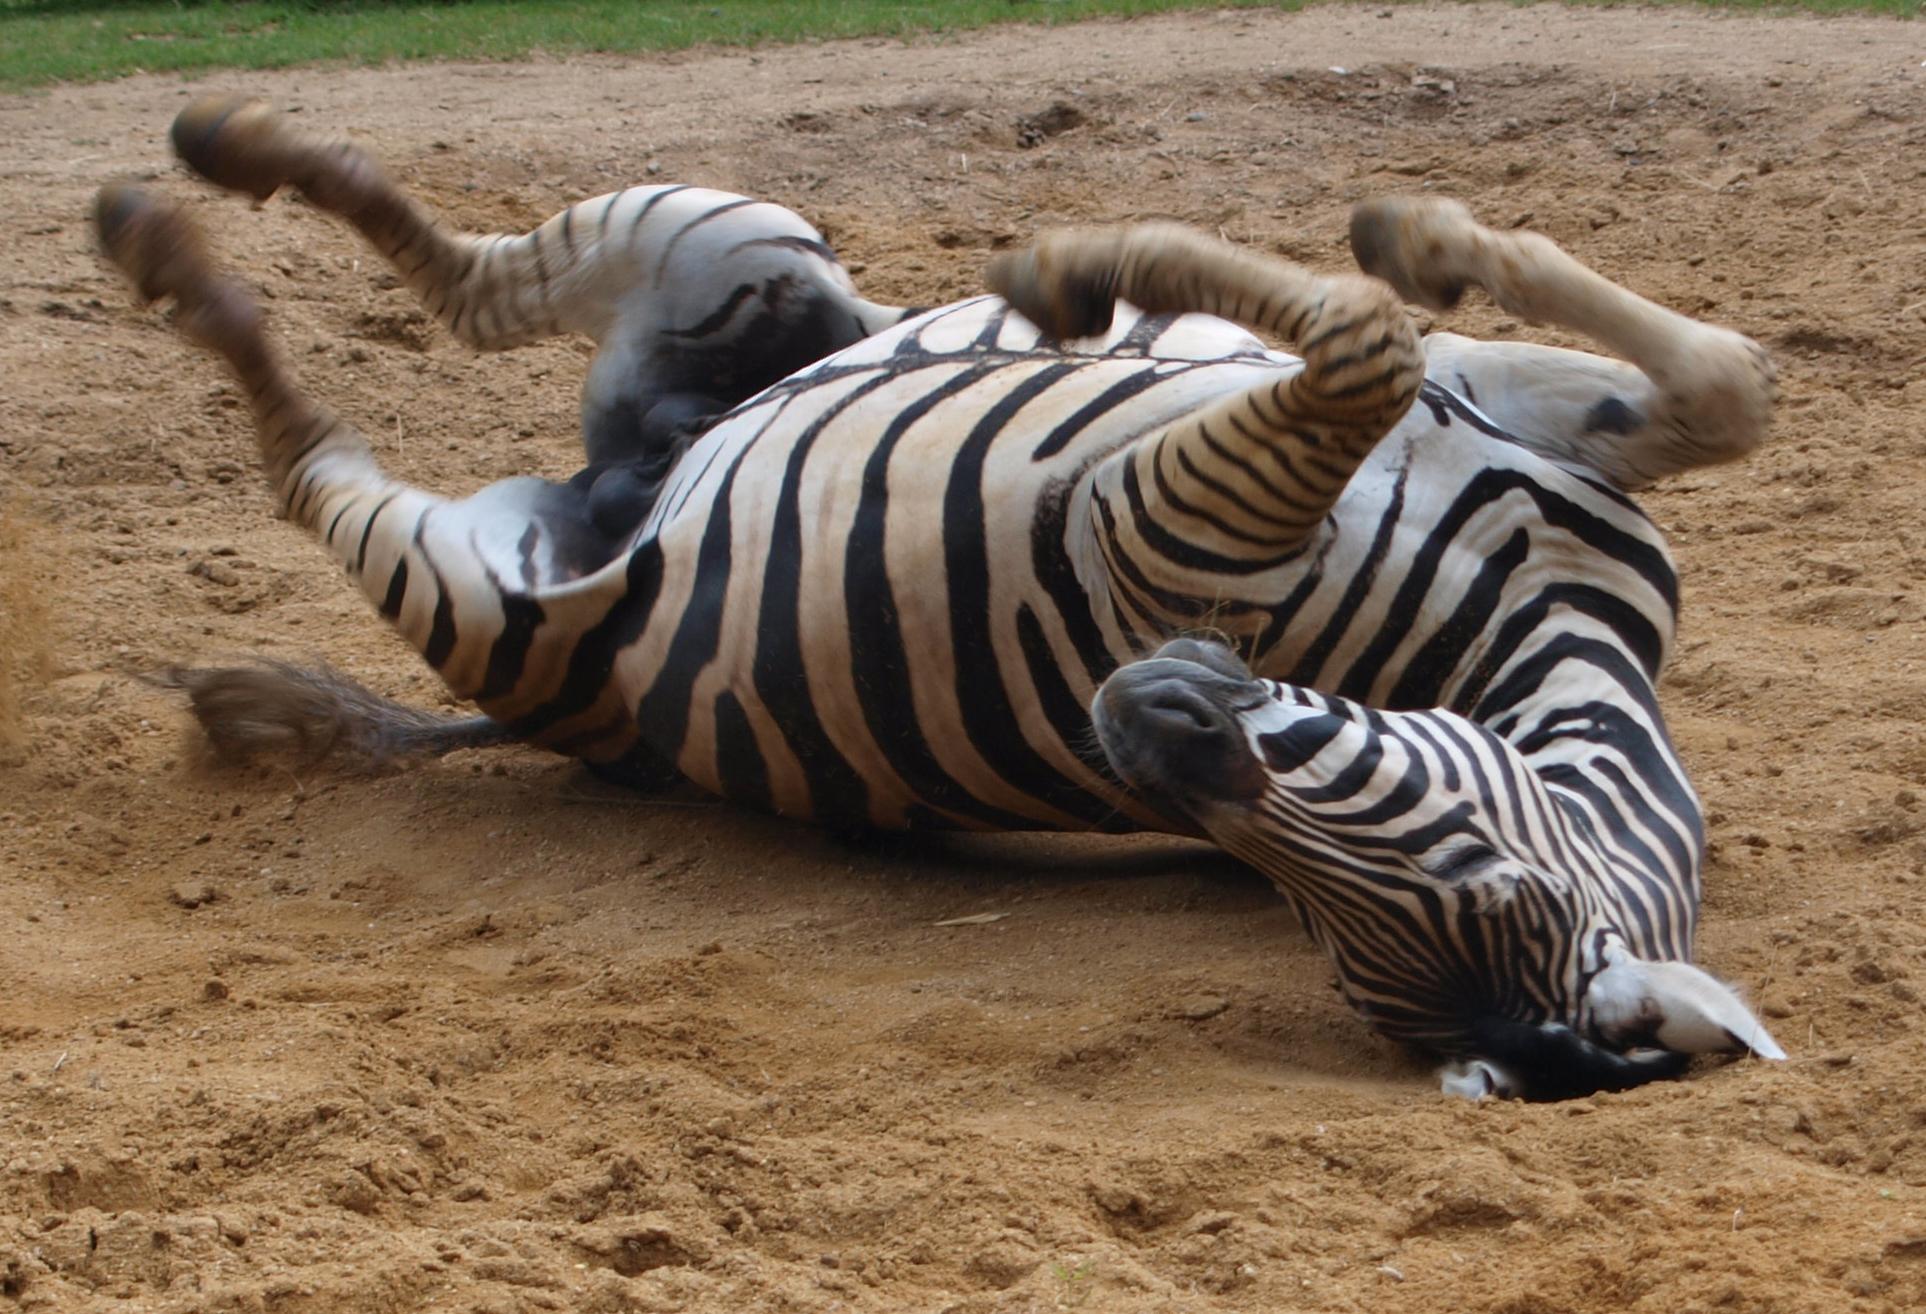 File:Zebra im Sand.jpg - Wikimedia Commons